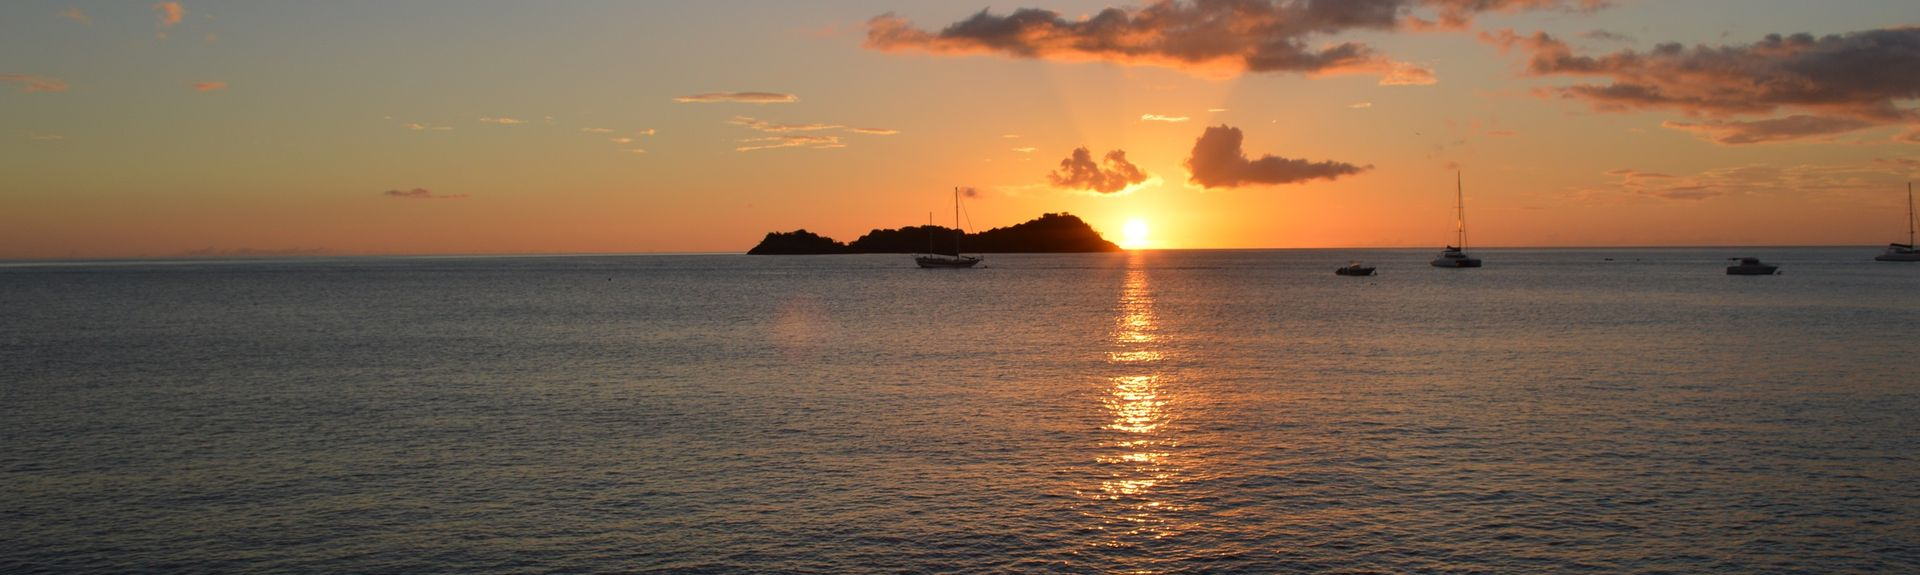 Goyave, Basse-Terre, Guadeloupe